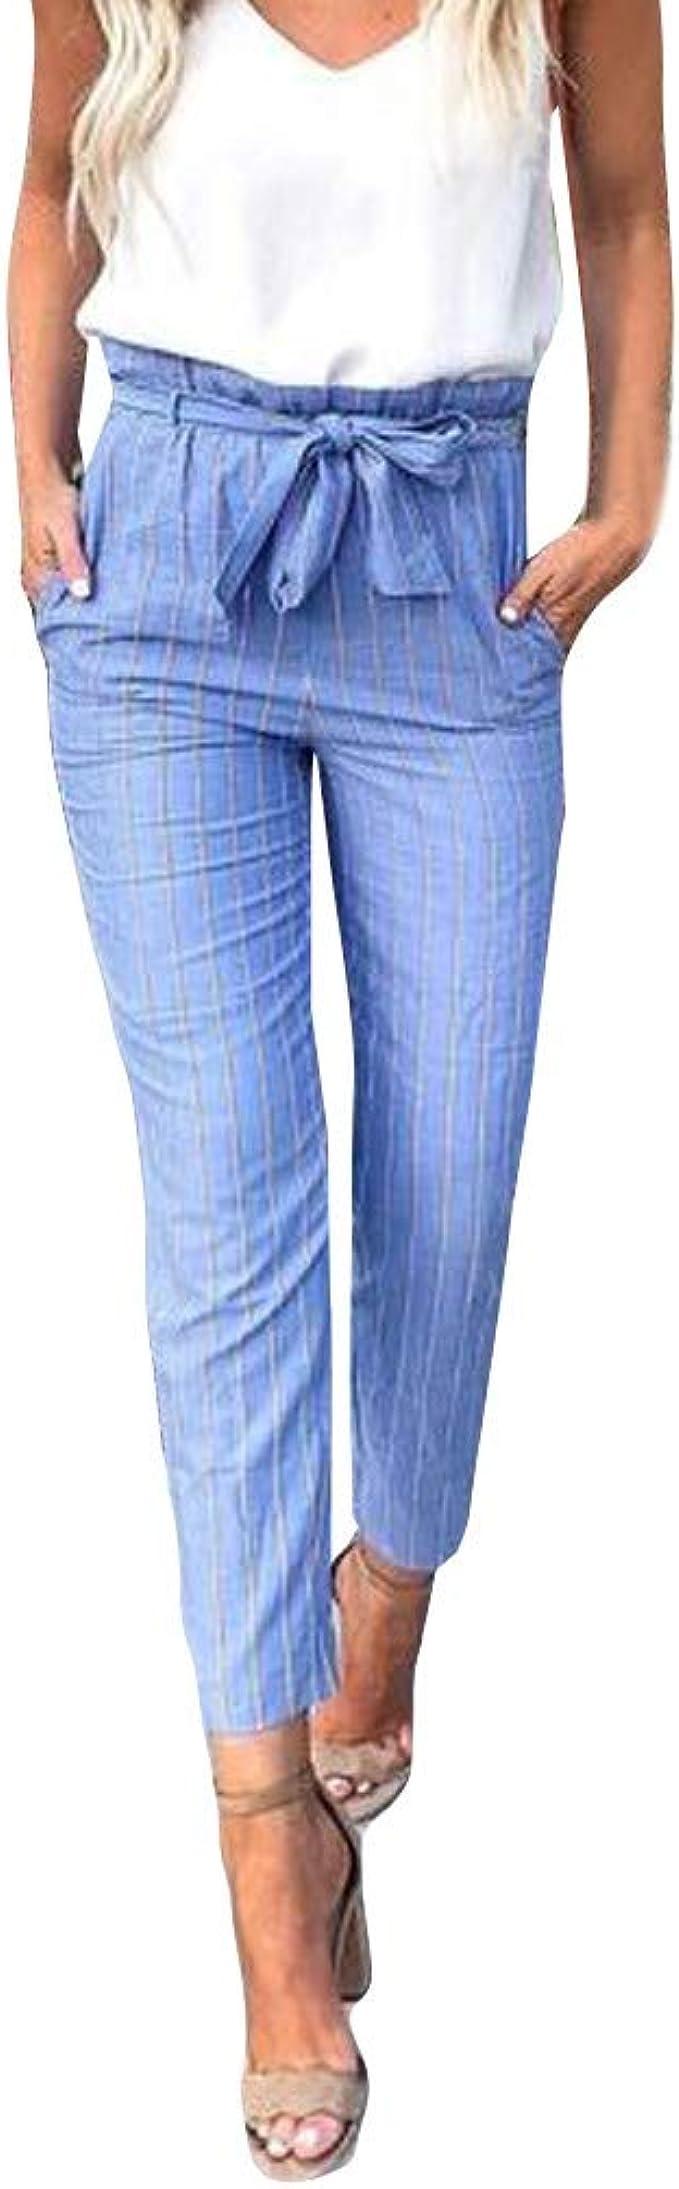 Amazon Com Nrealy Pantalones Womens Fashion Tartan High Waist Stripe Trousers Ladies Pants Clothing